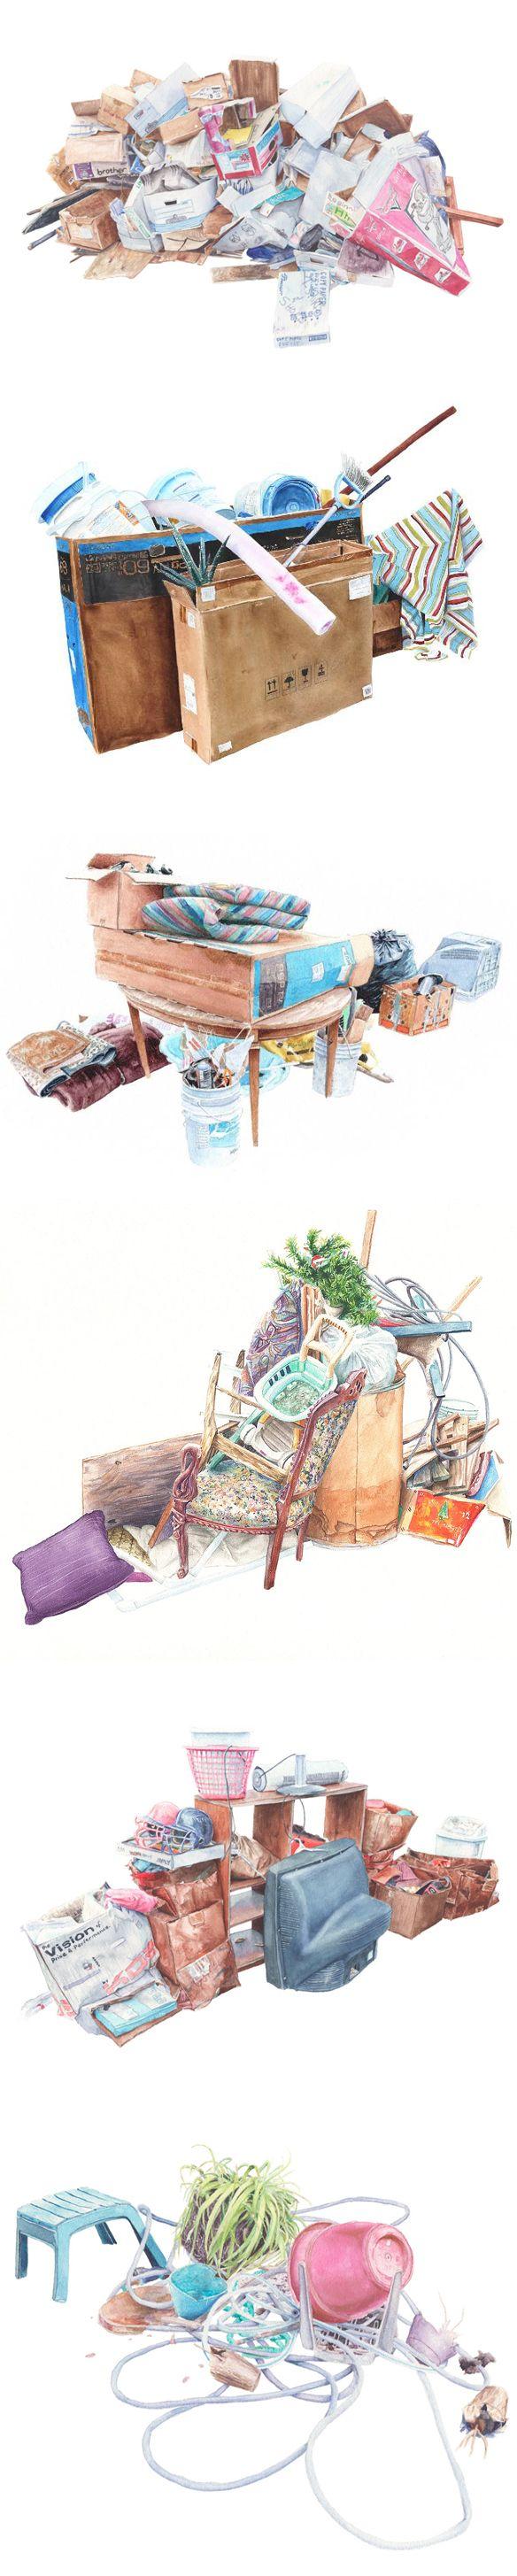 jason webb - paintings of trash <3